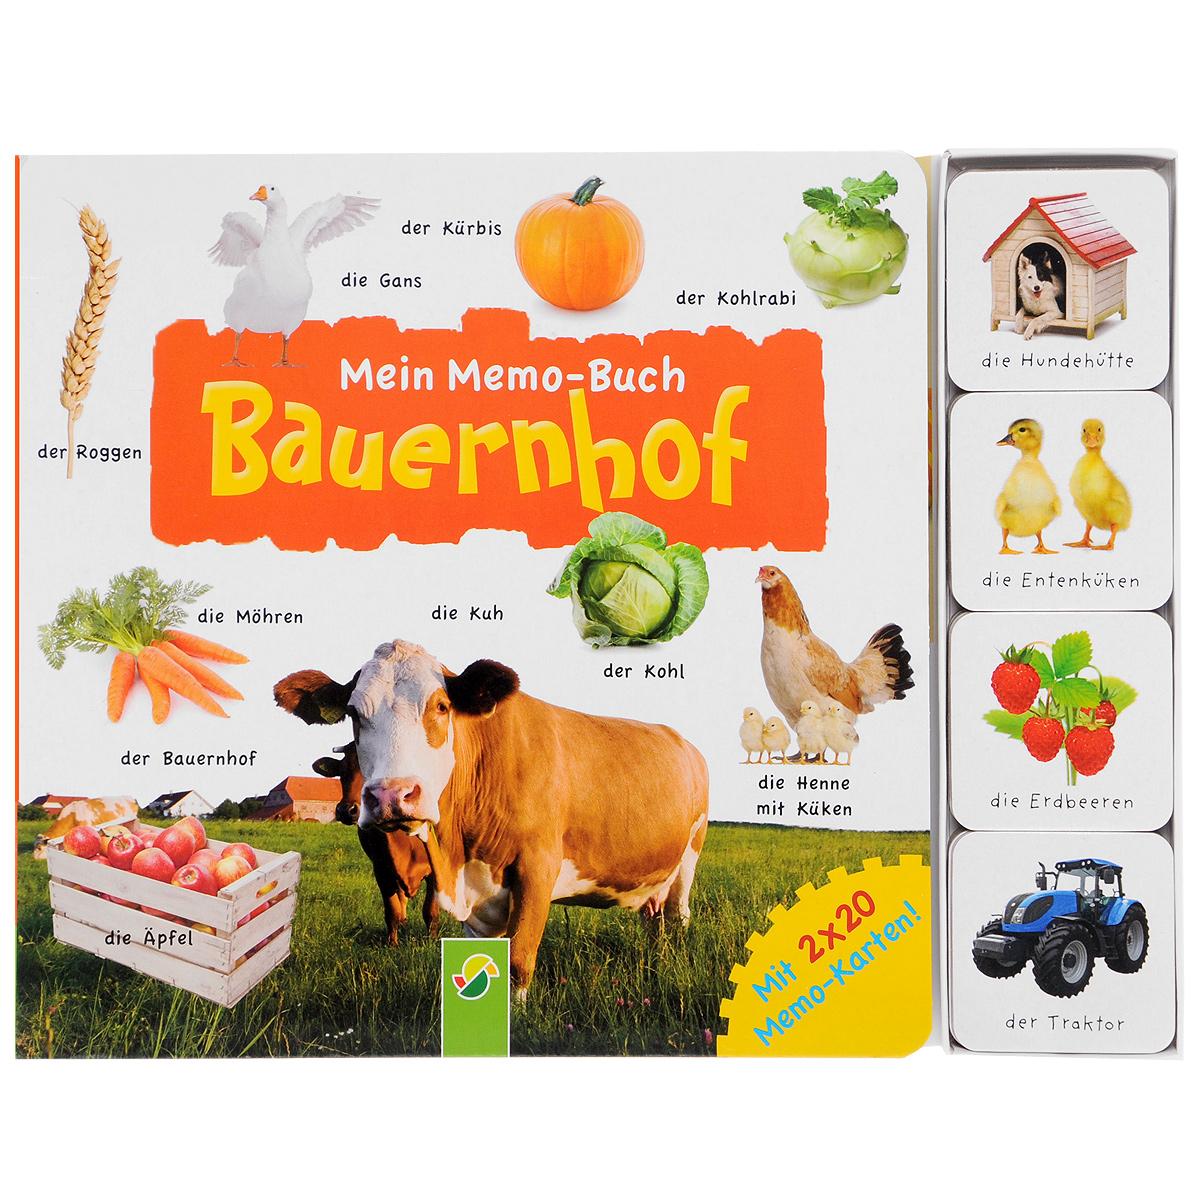 Mein Memo-Buch: Bauernhof (+ набор из 40 карточек)